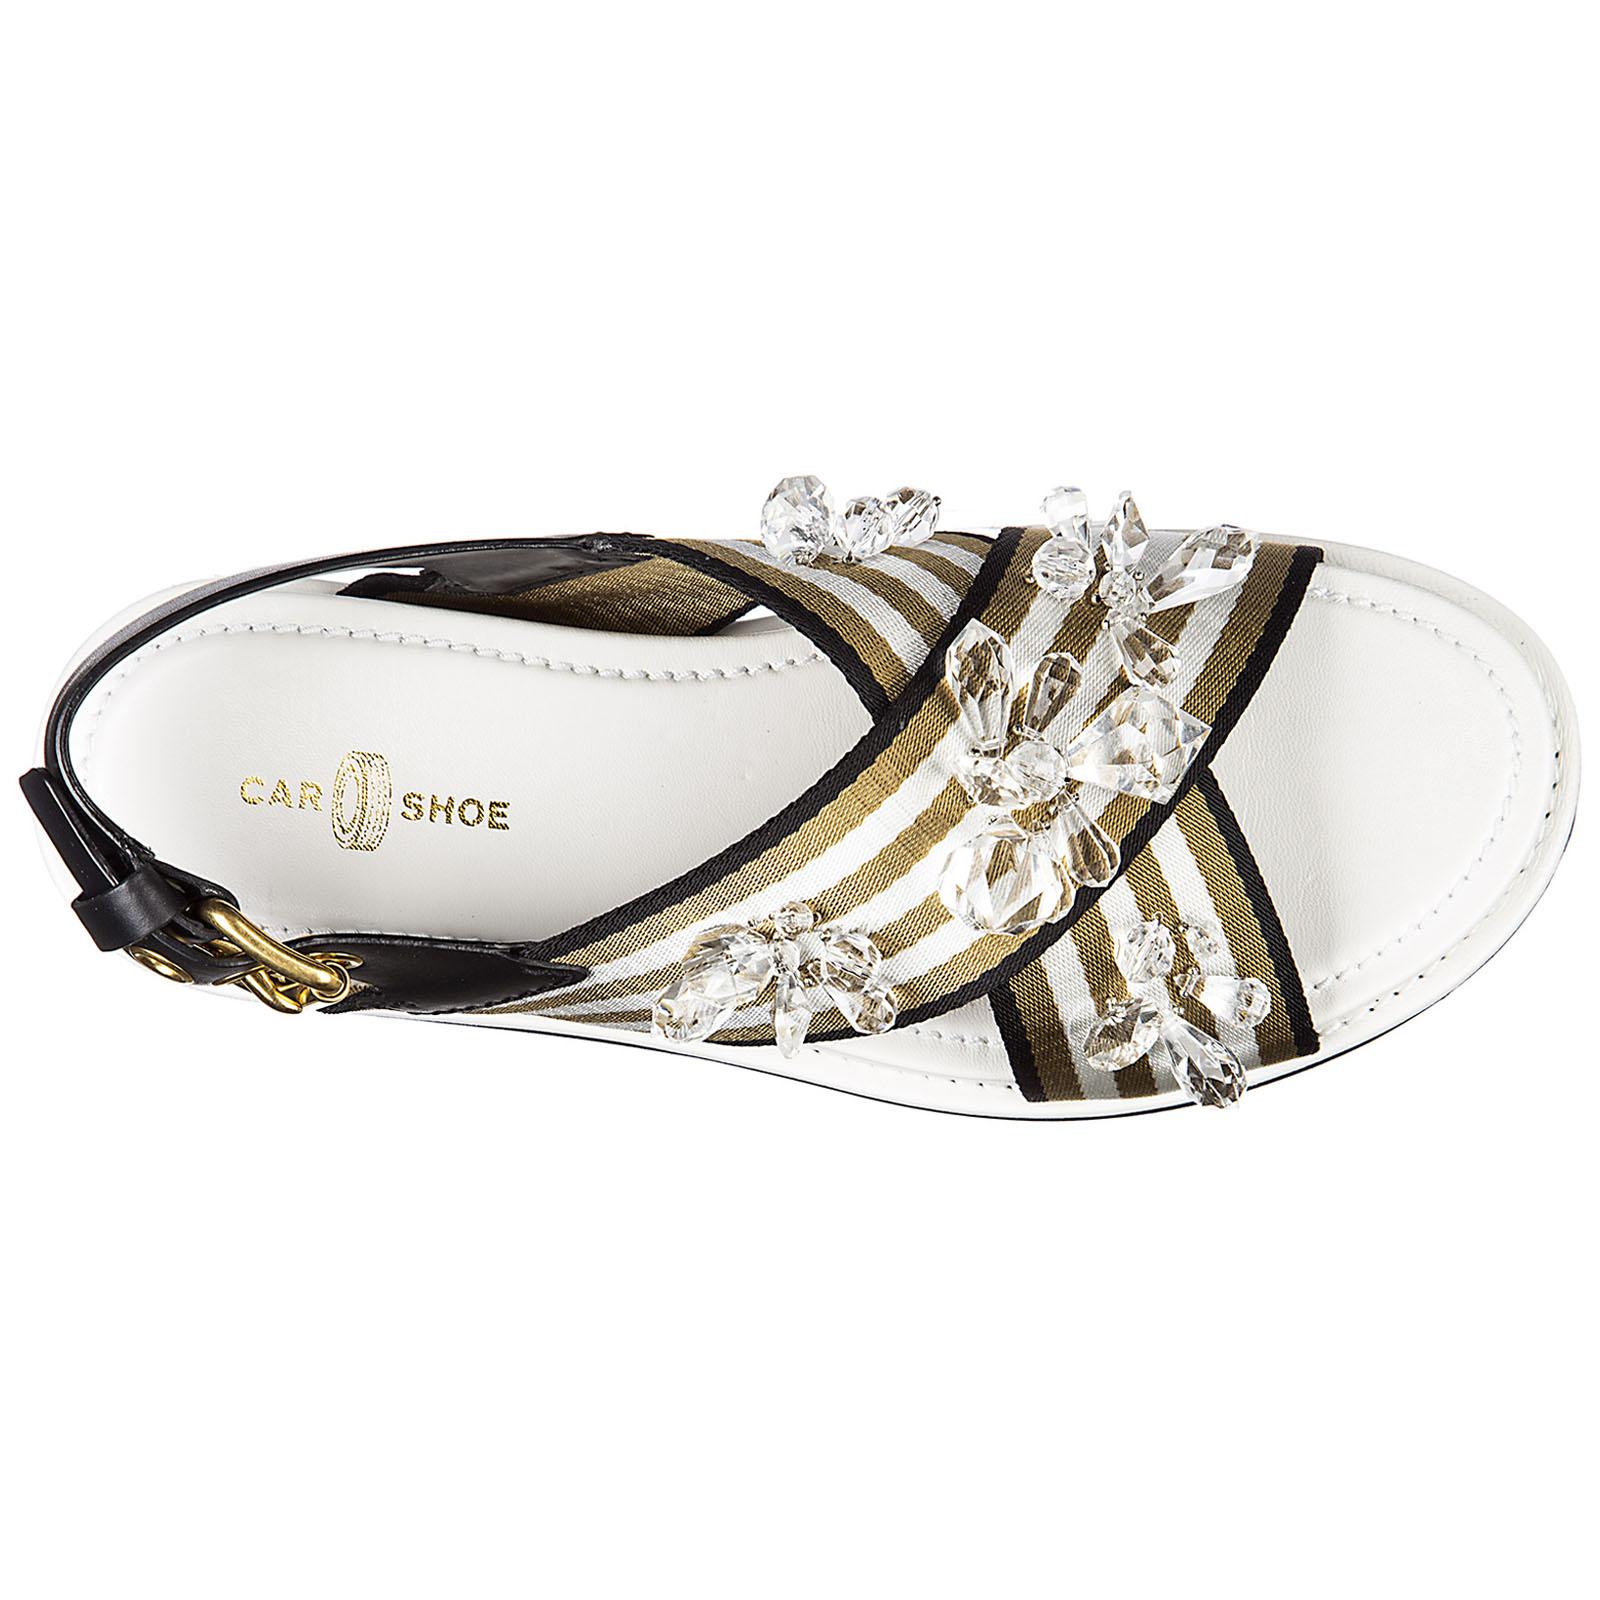 сандалии женские кожаные  nastro riga